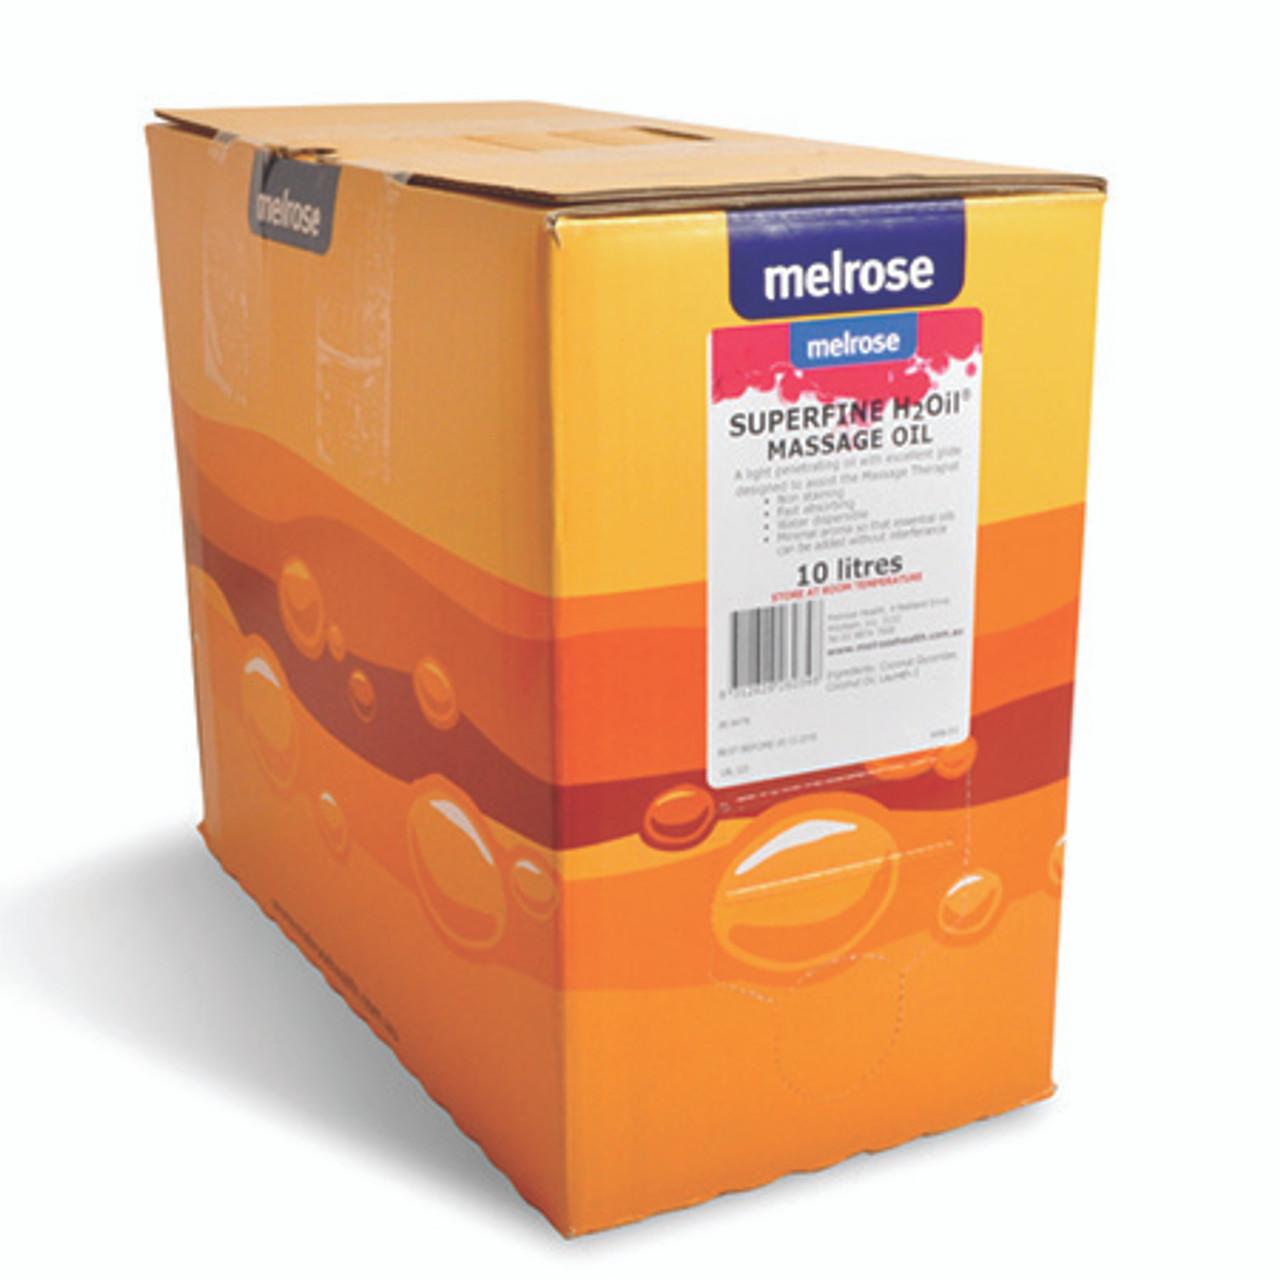 Melrose Superfine Water Dispersible Massage Oil - 10 Litre